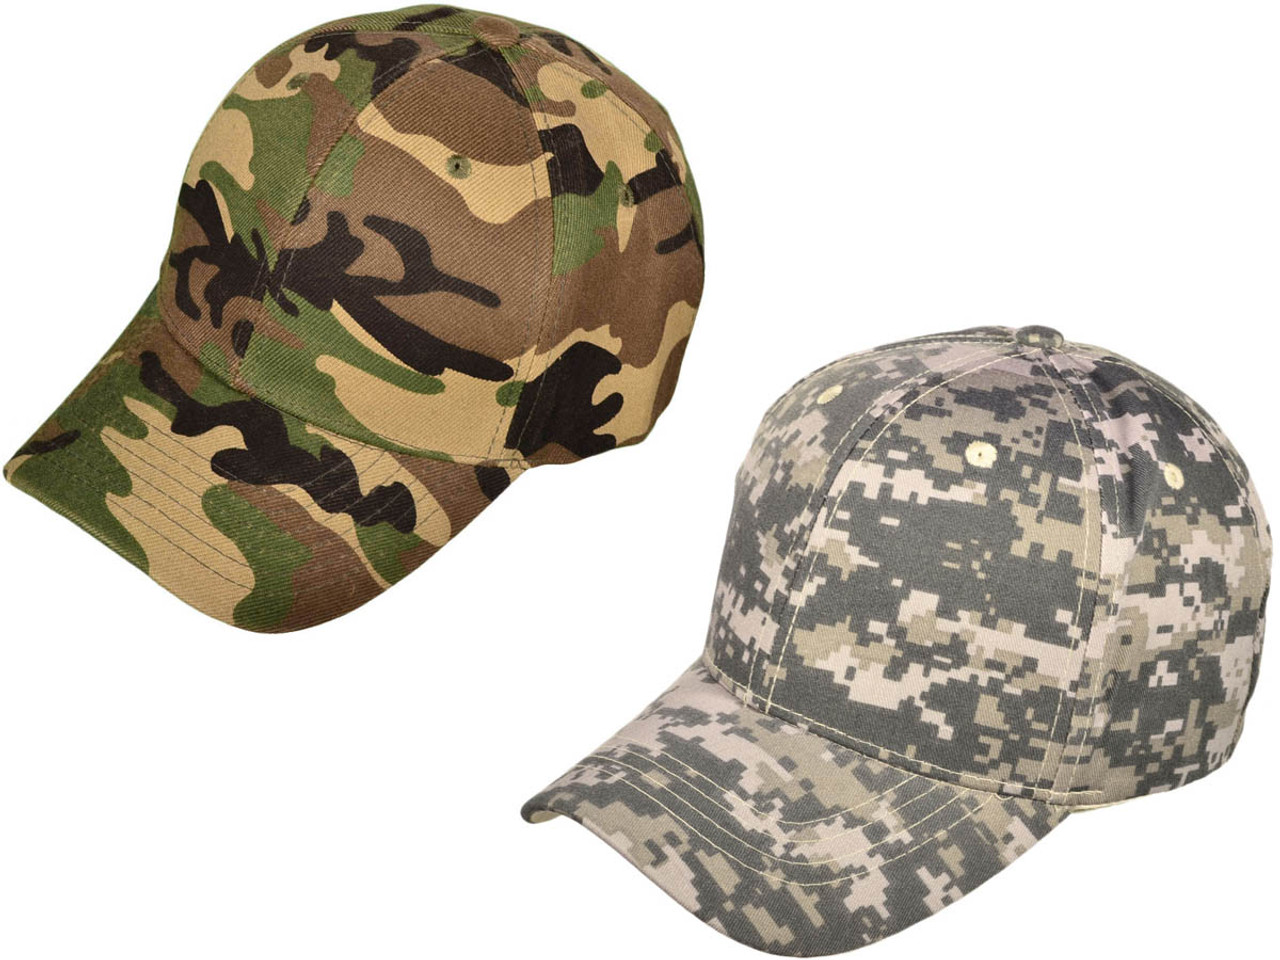 606b705beef Wholesale 6 Panel Mid Profile Blank Baseball Caps camo camouflage ...